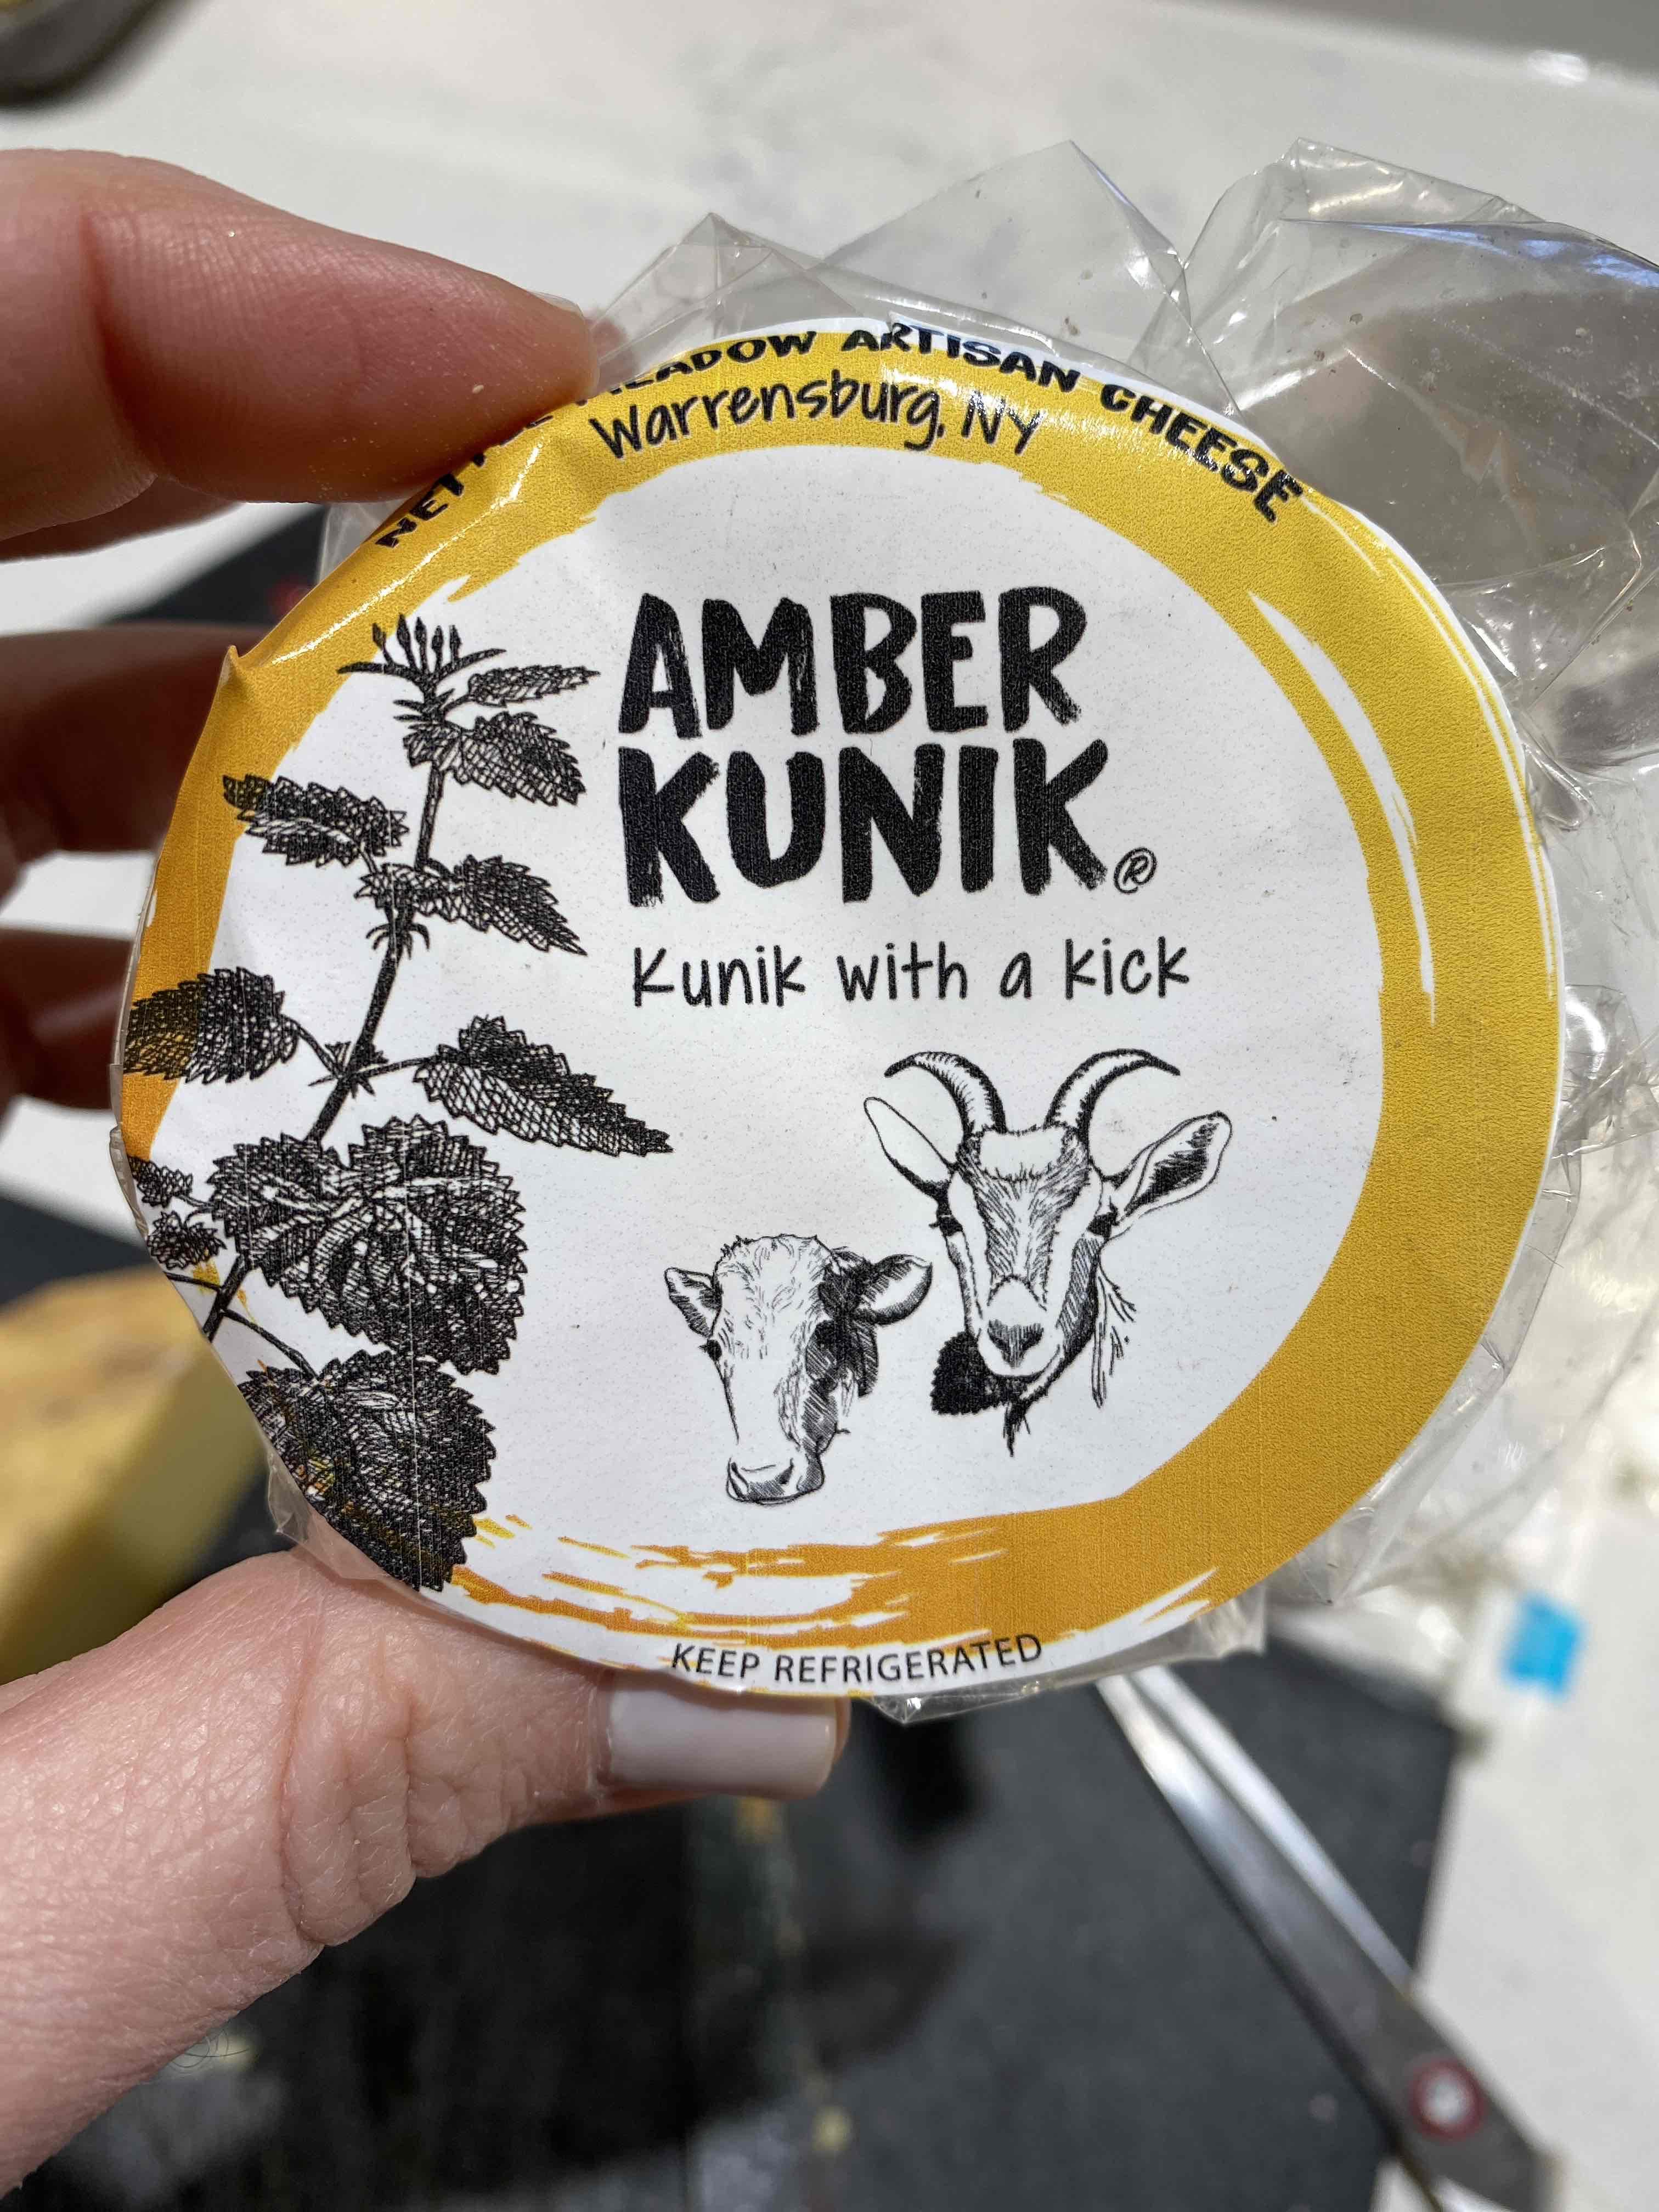 Amber Kunik